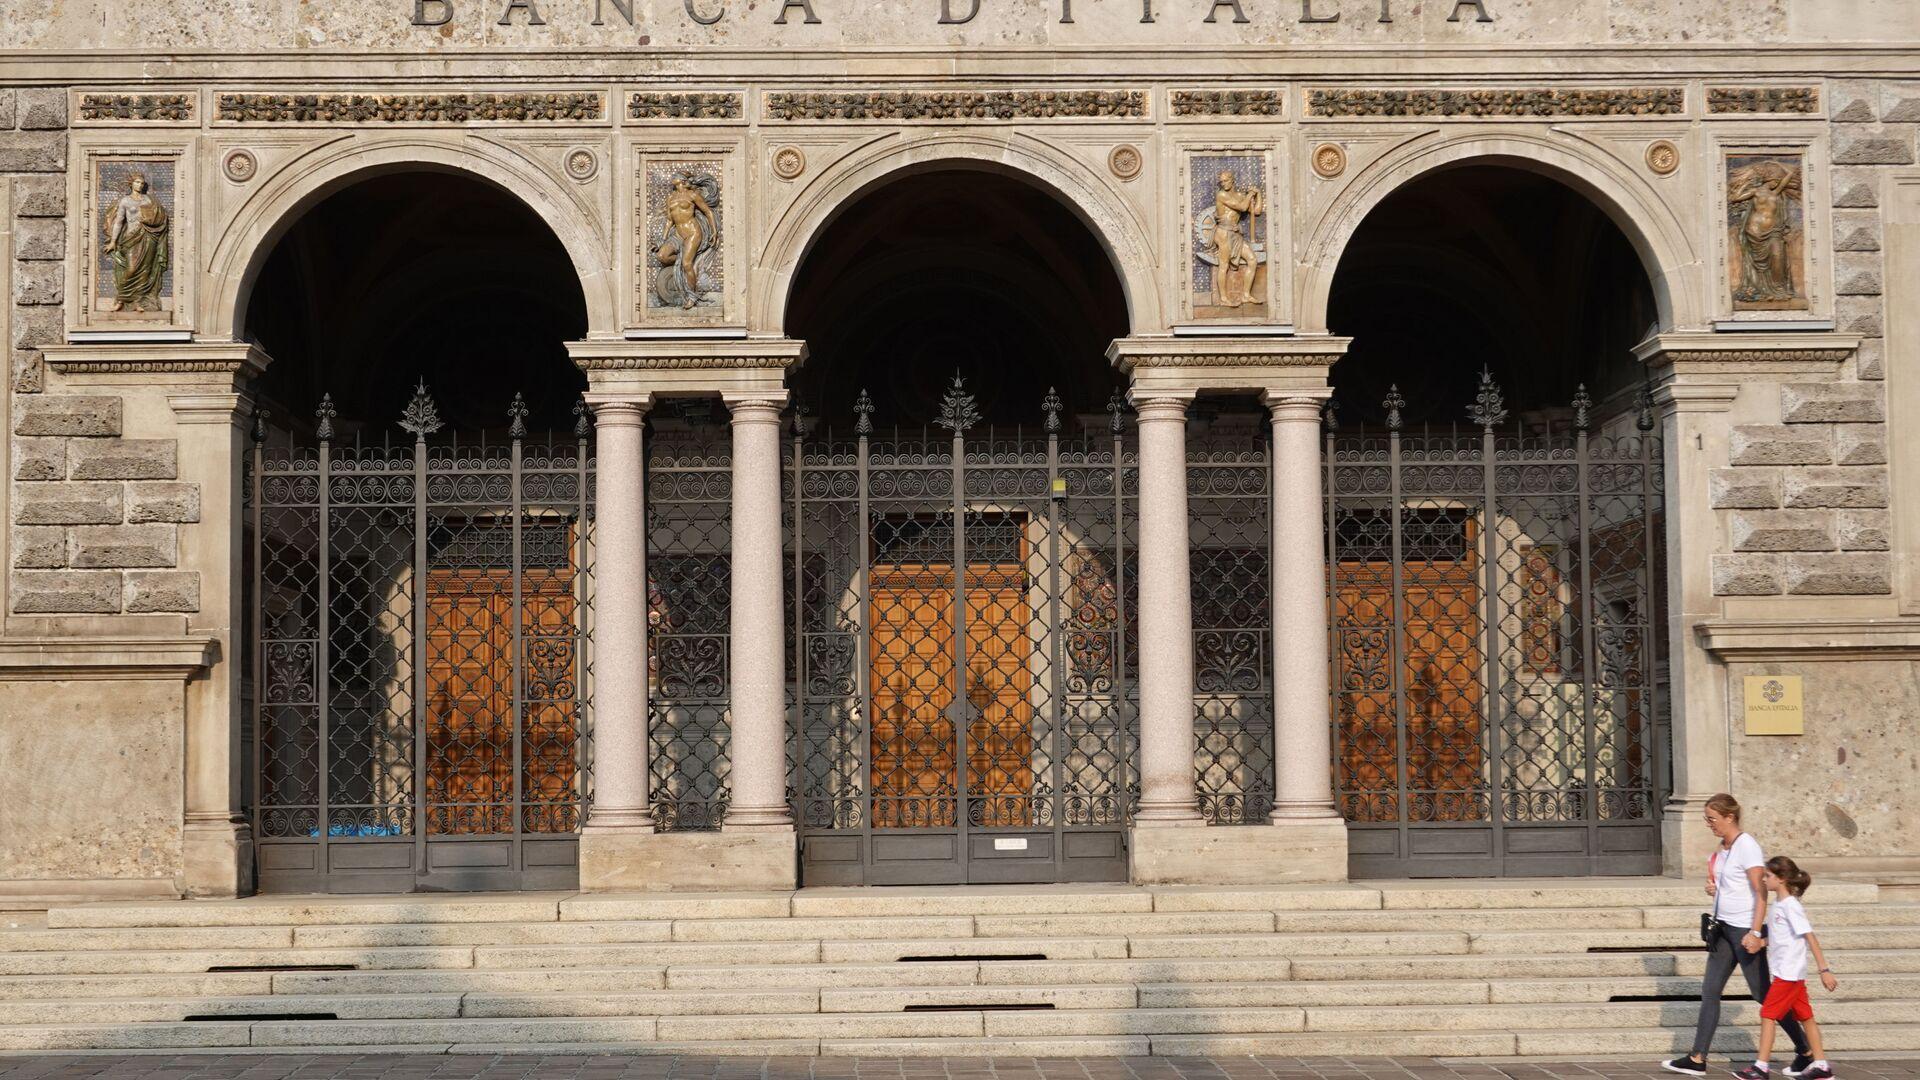 Banca d'Italia - Sputnik Italia, 1920, 06.02.2021